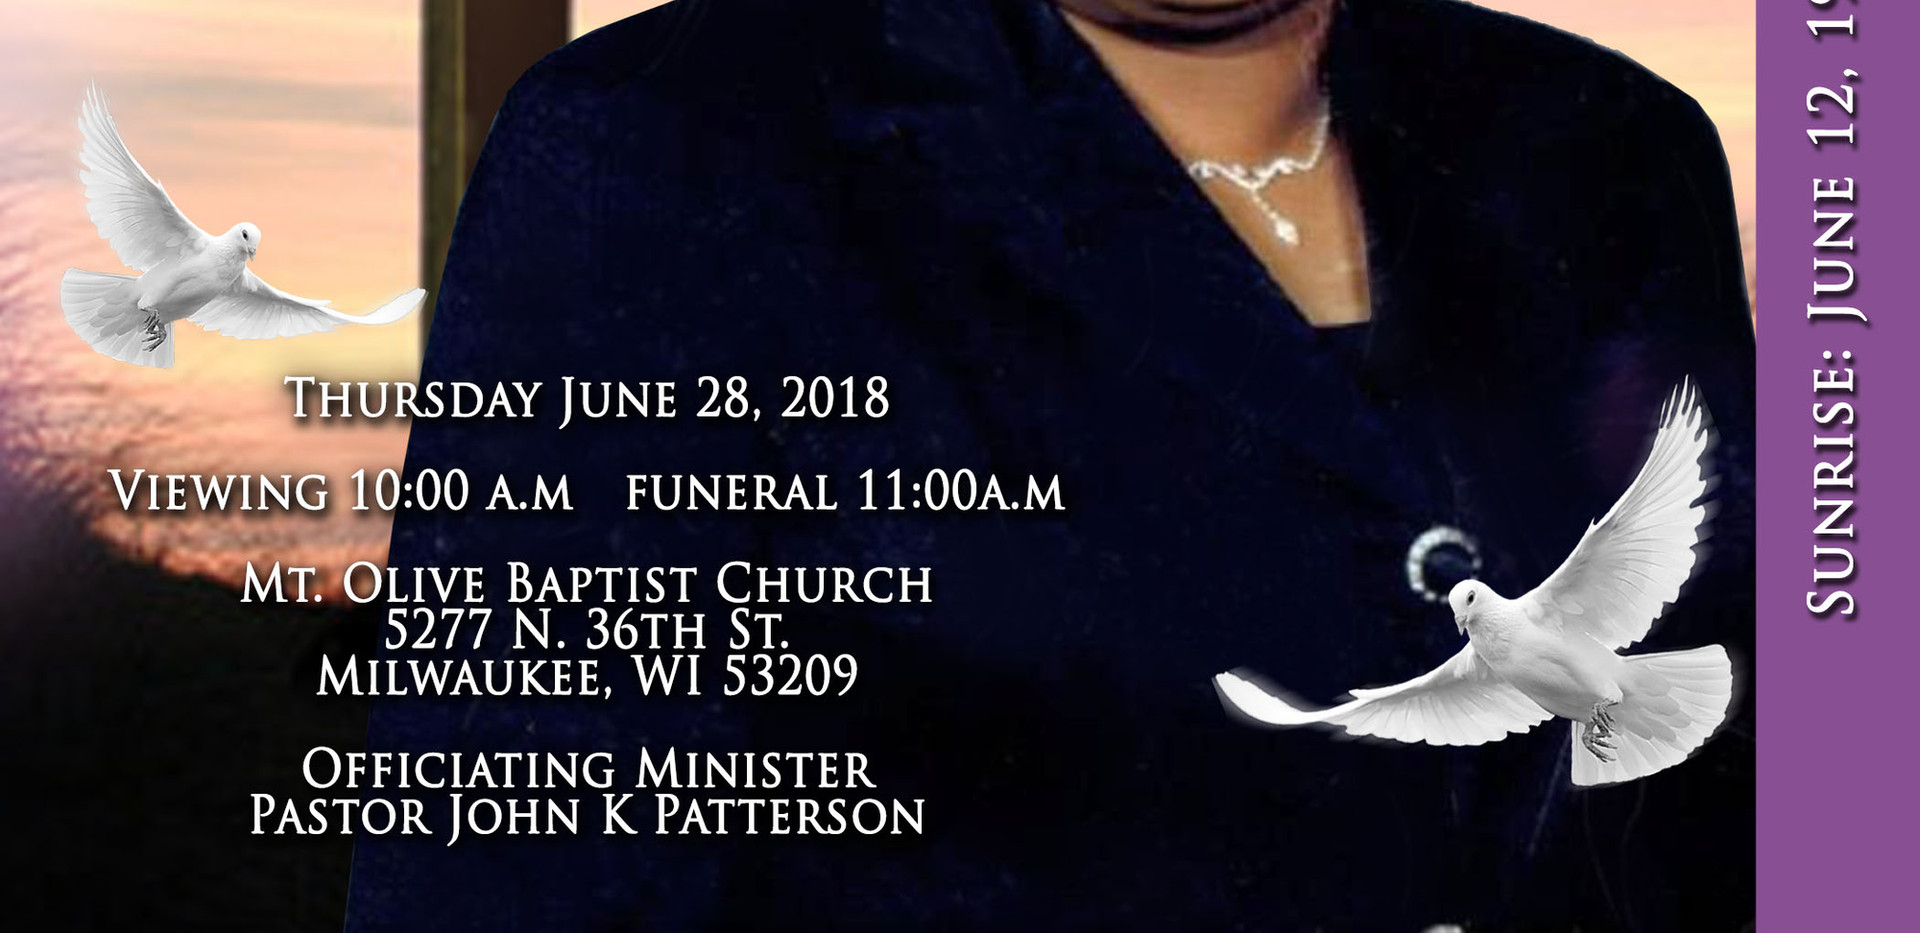 Kim Stephens Obituary Cover.jpg